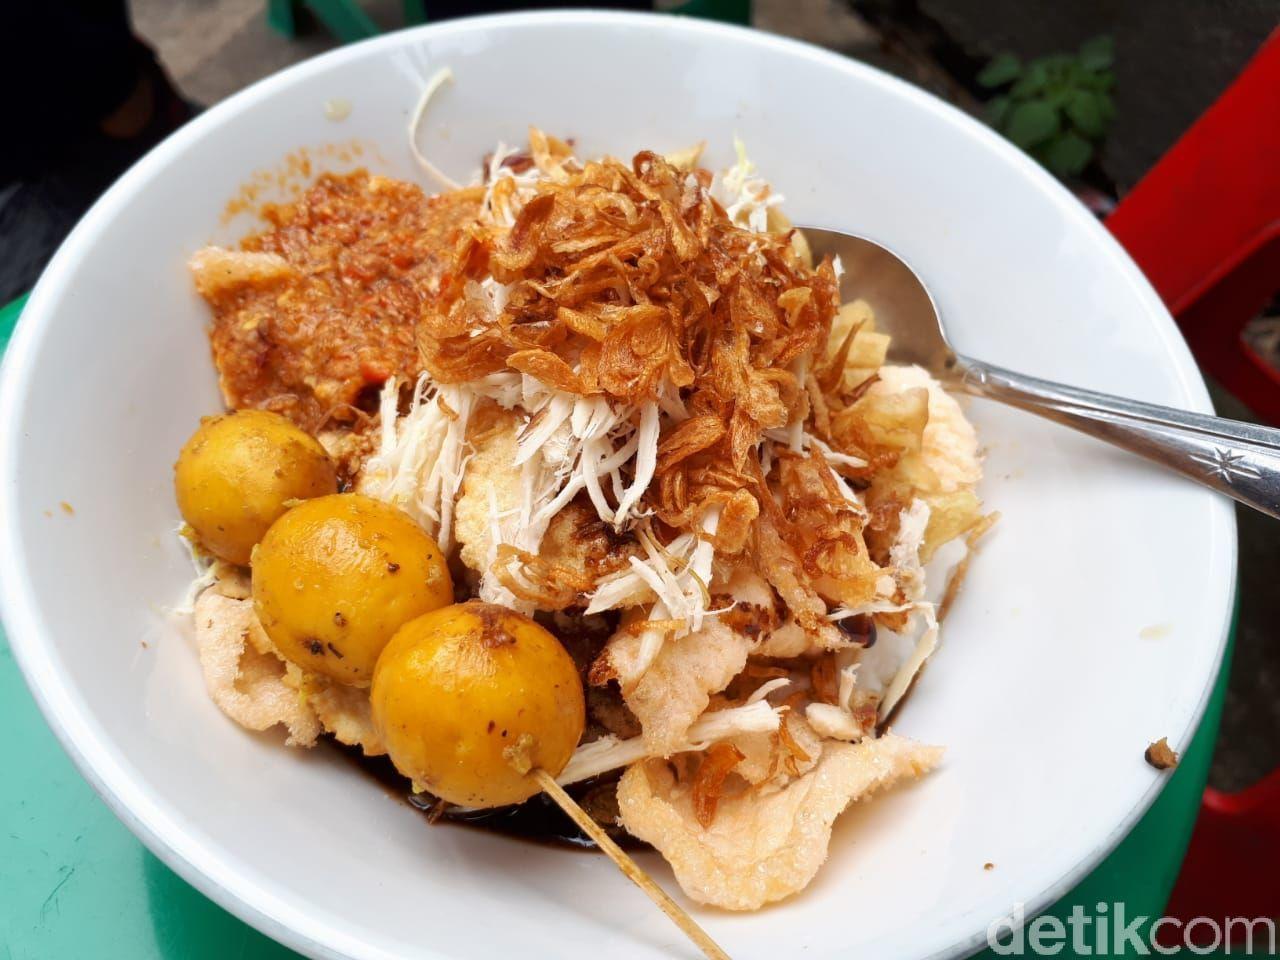 Gowes di Depok, Jangan Lupa Mampir Makan Bubur Ayam Enak di 5 Tempat Ini